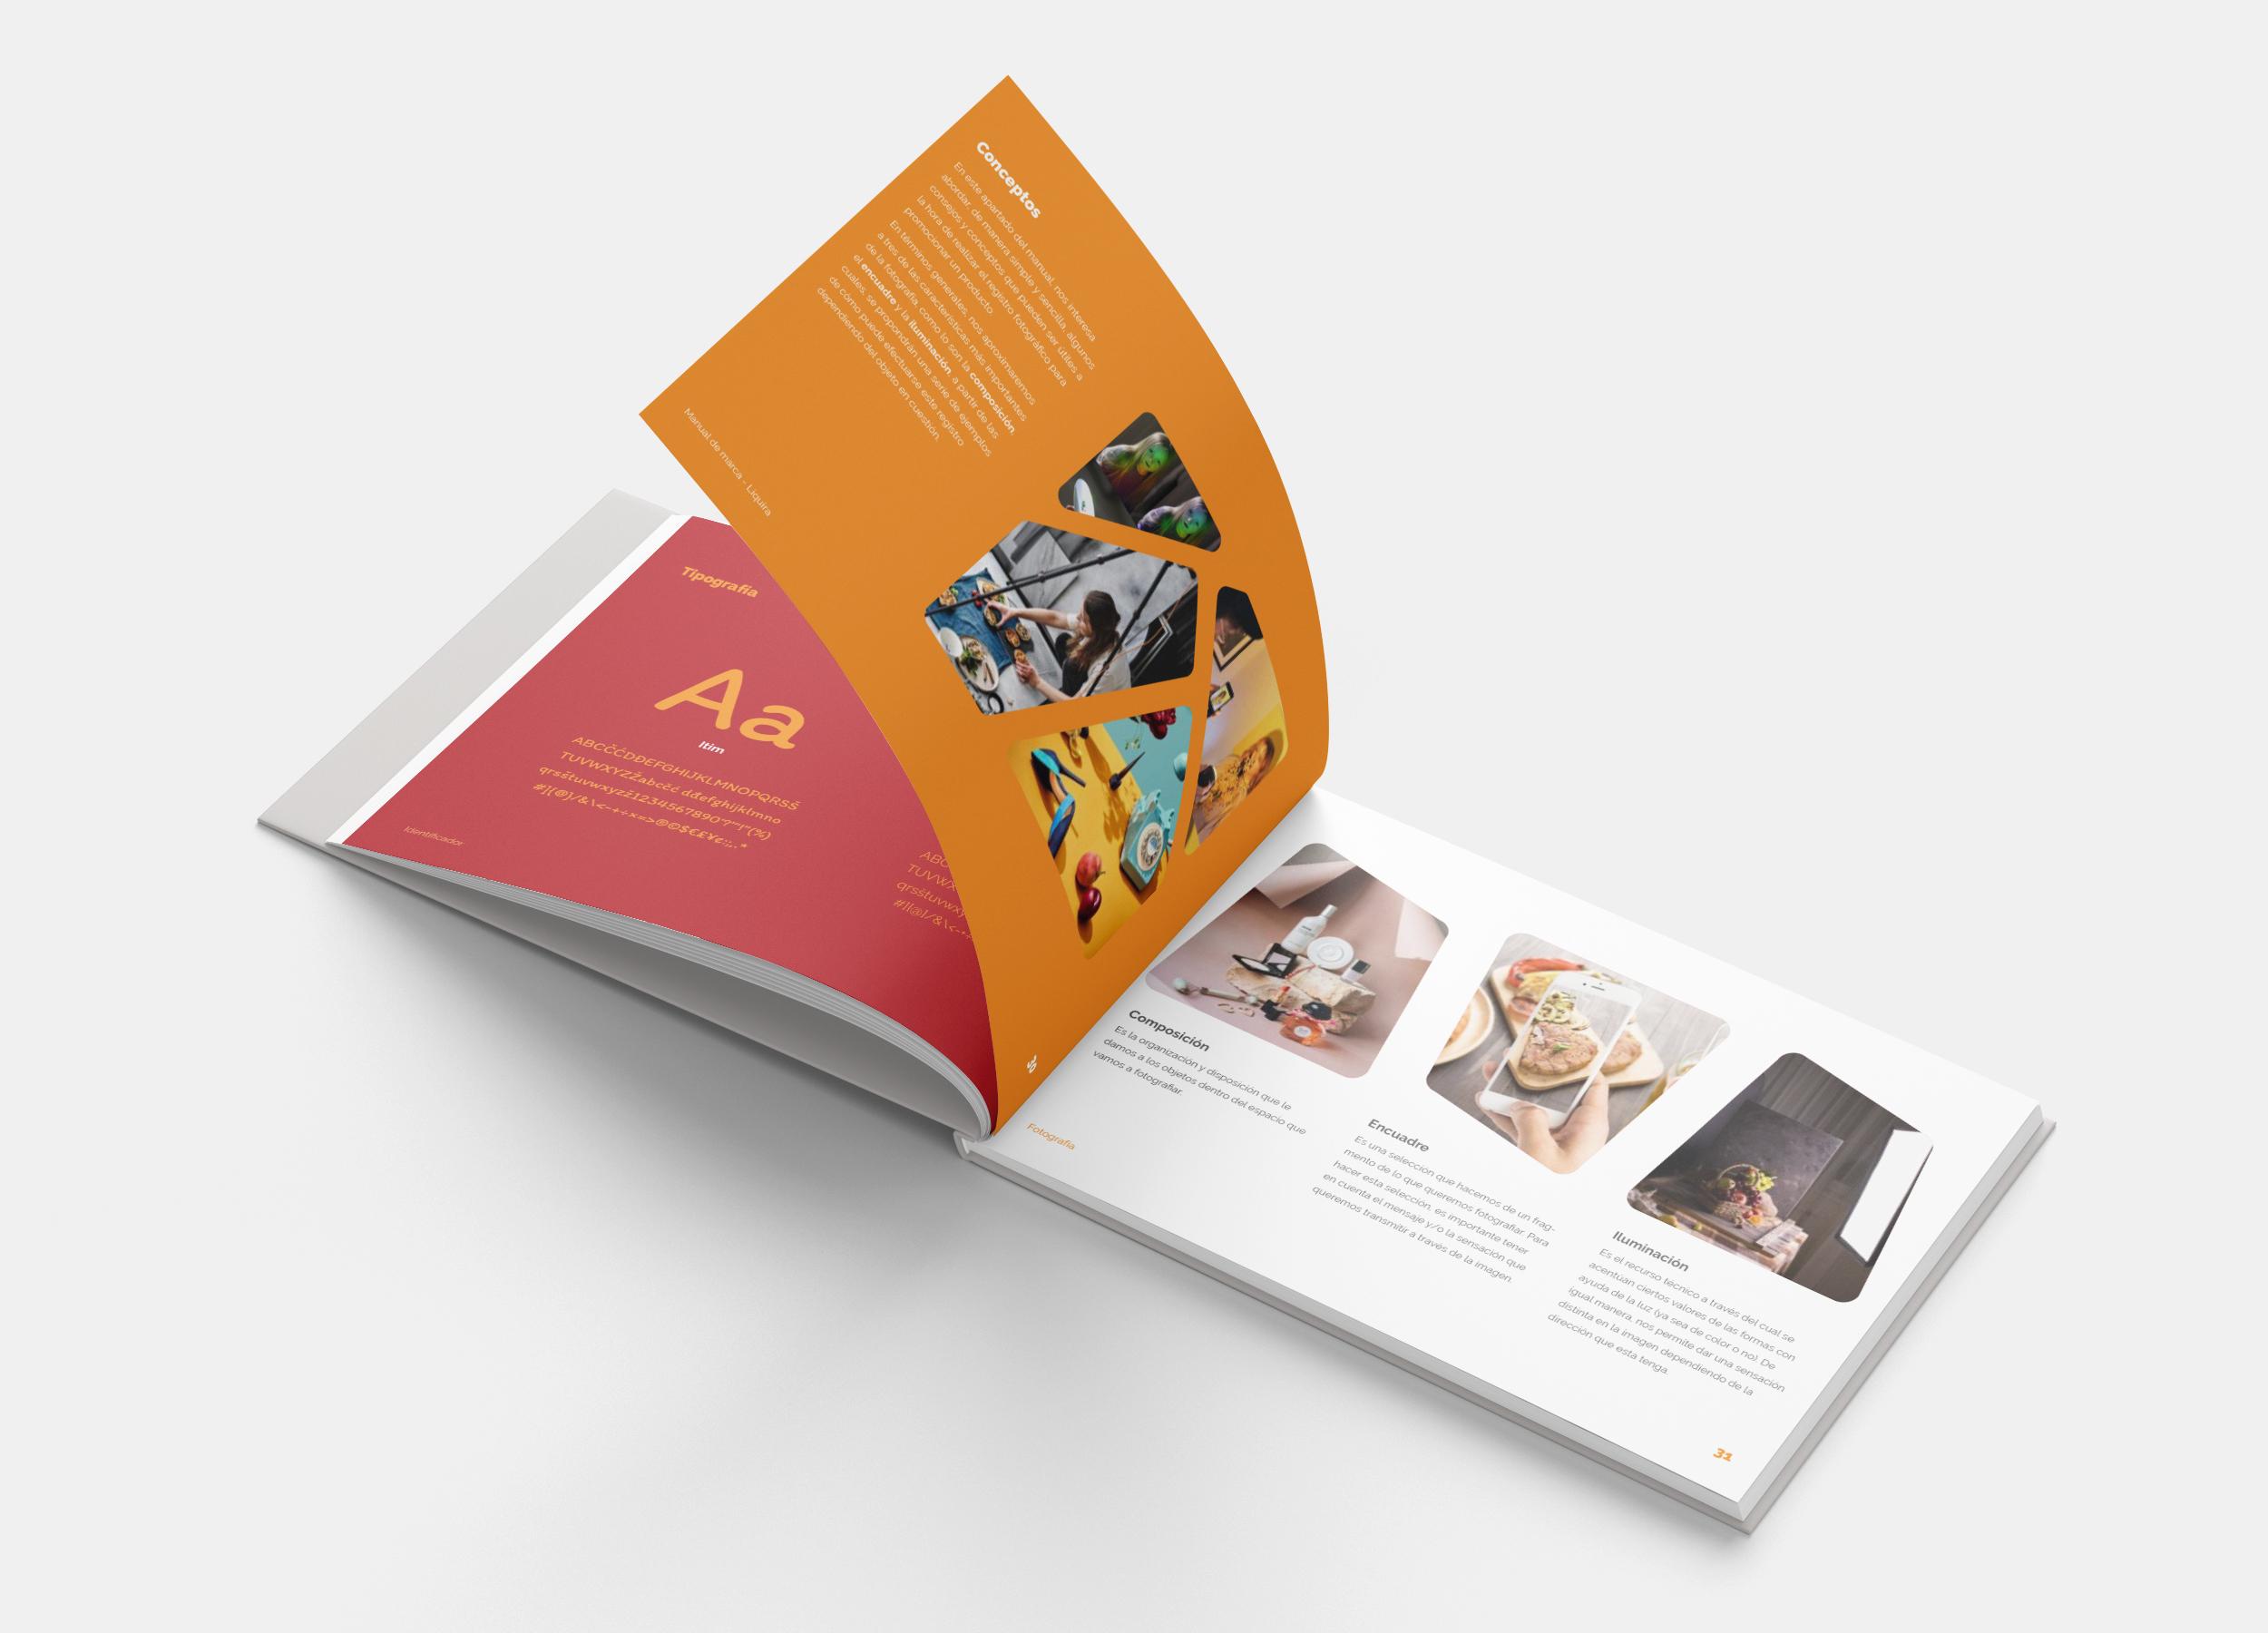 Hoja de resumen Asociación de Artesanos Muiscas Liquira 2020-I